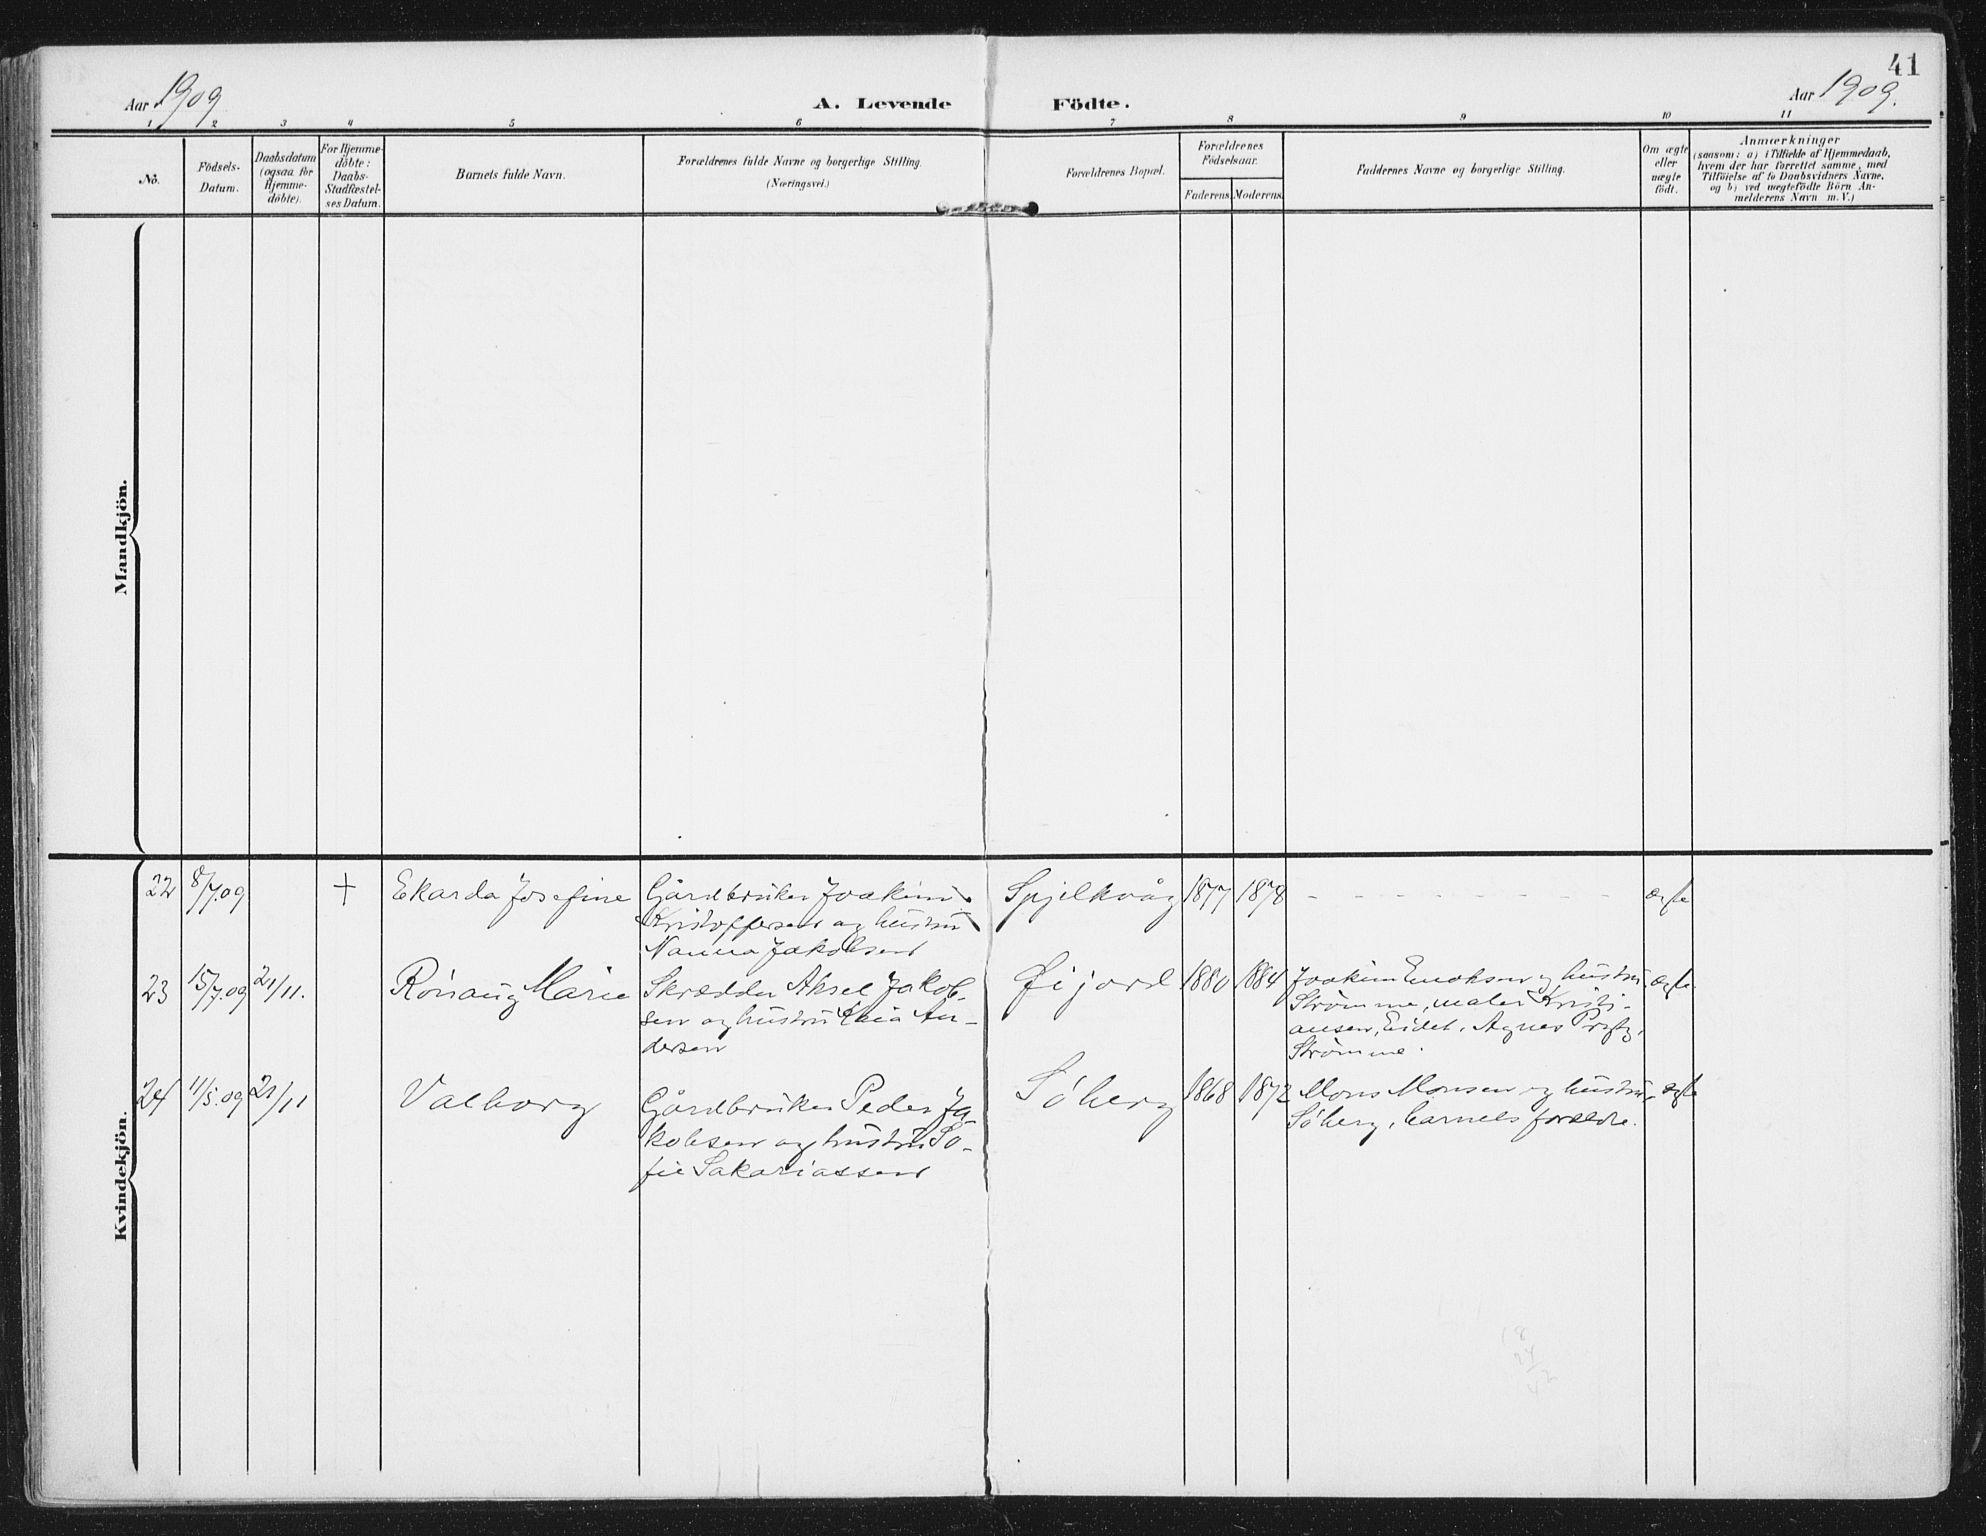 SAT, Ministerialprotokoller, klokkerbøker og fødselsregistre - Nordland, 892/L1321: Ministerialbok nr. 892A02, 1902-1918, s. 41